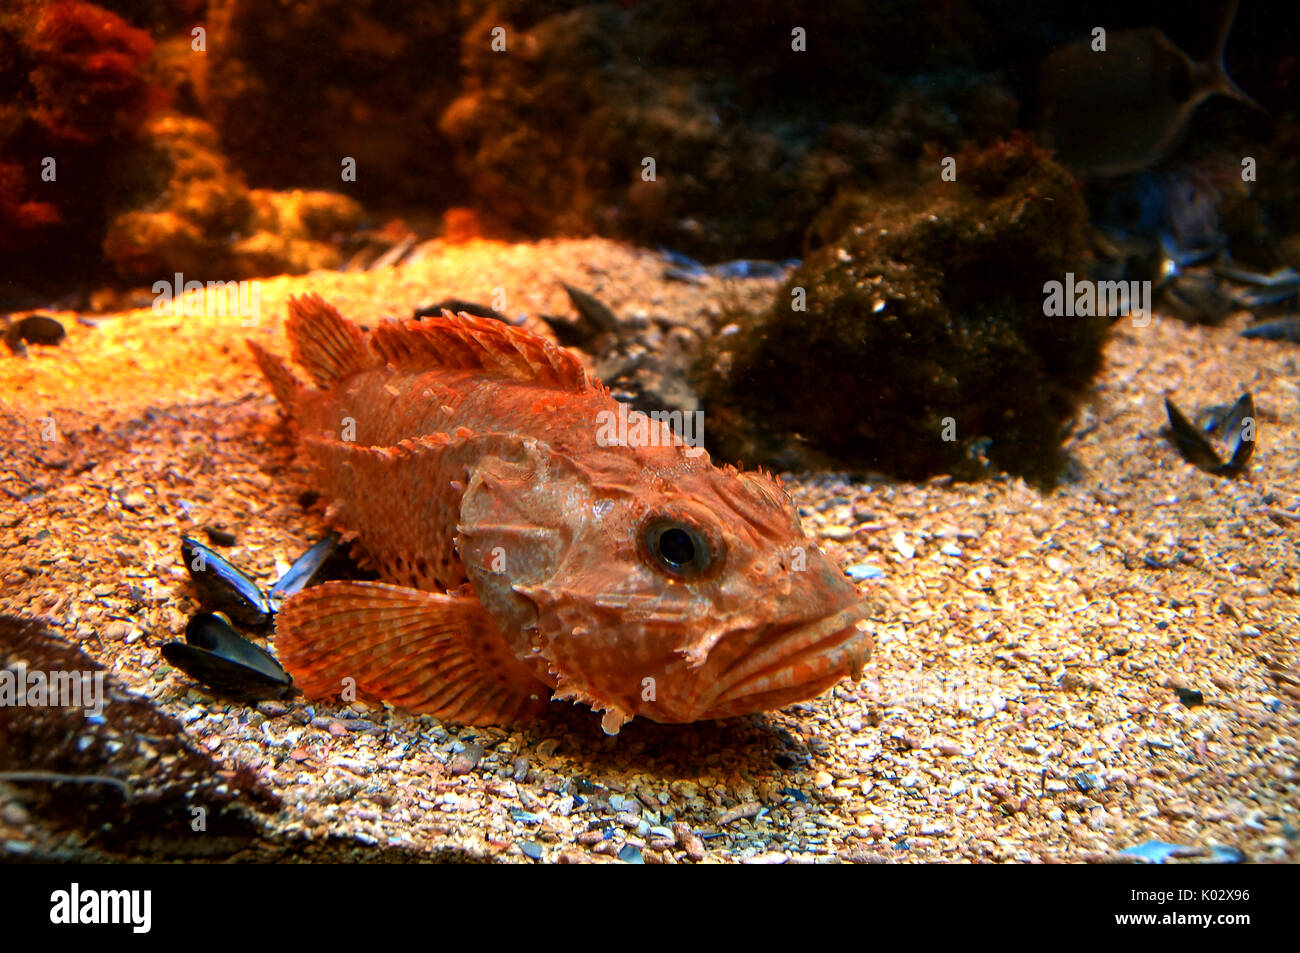 red-scorpionfish-scorpaena-scrofa-lying-